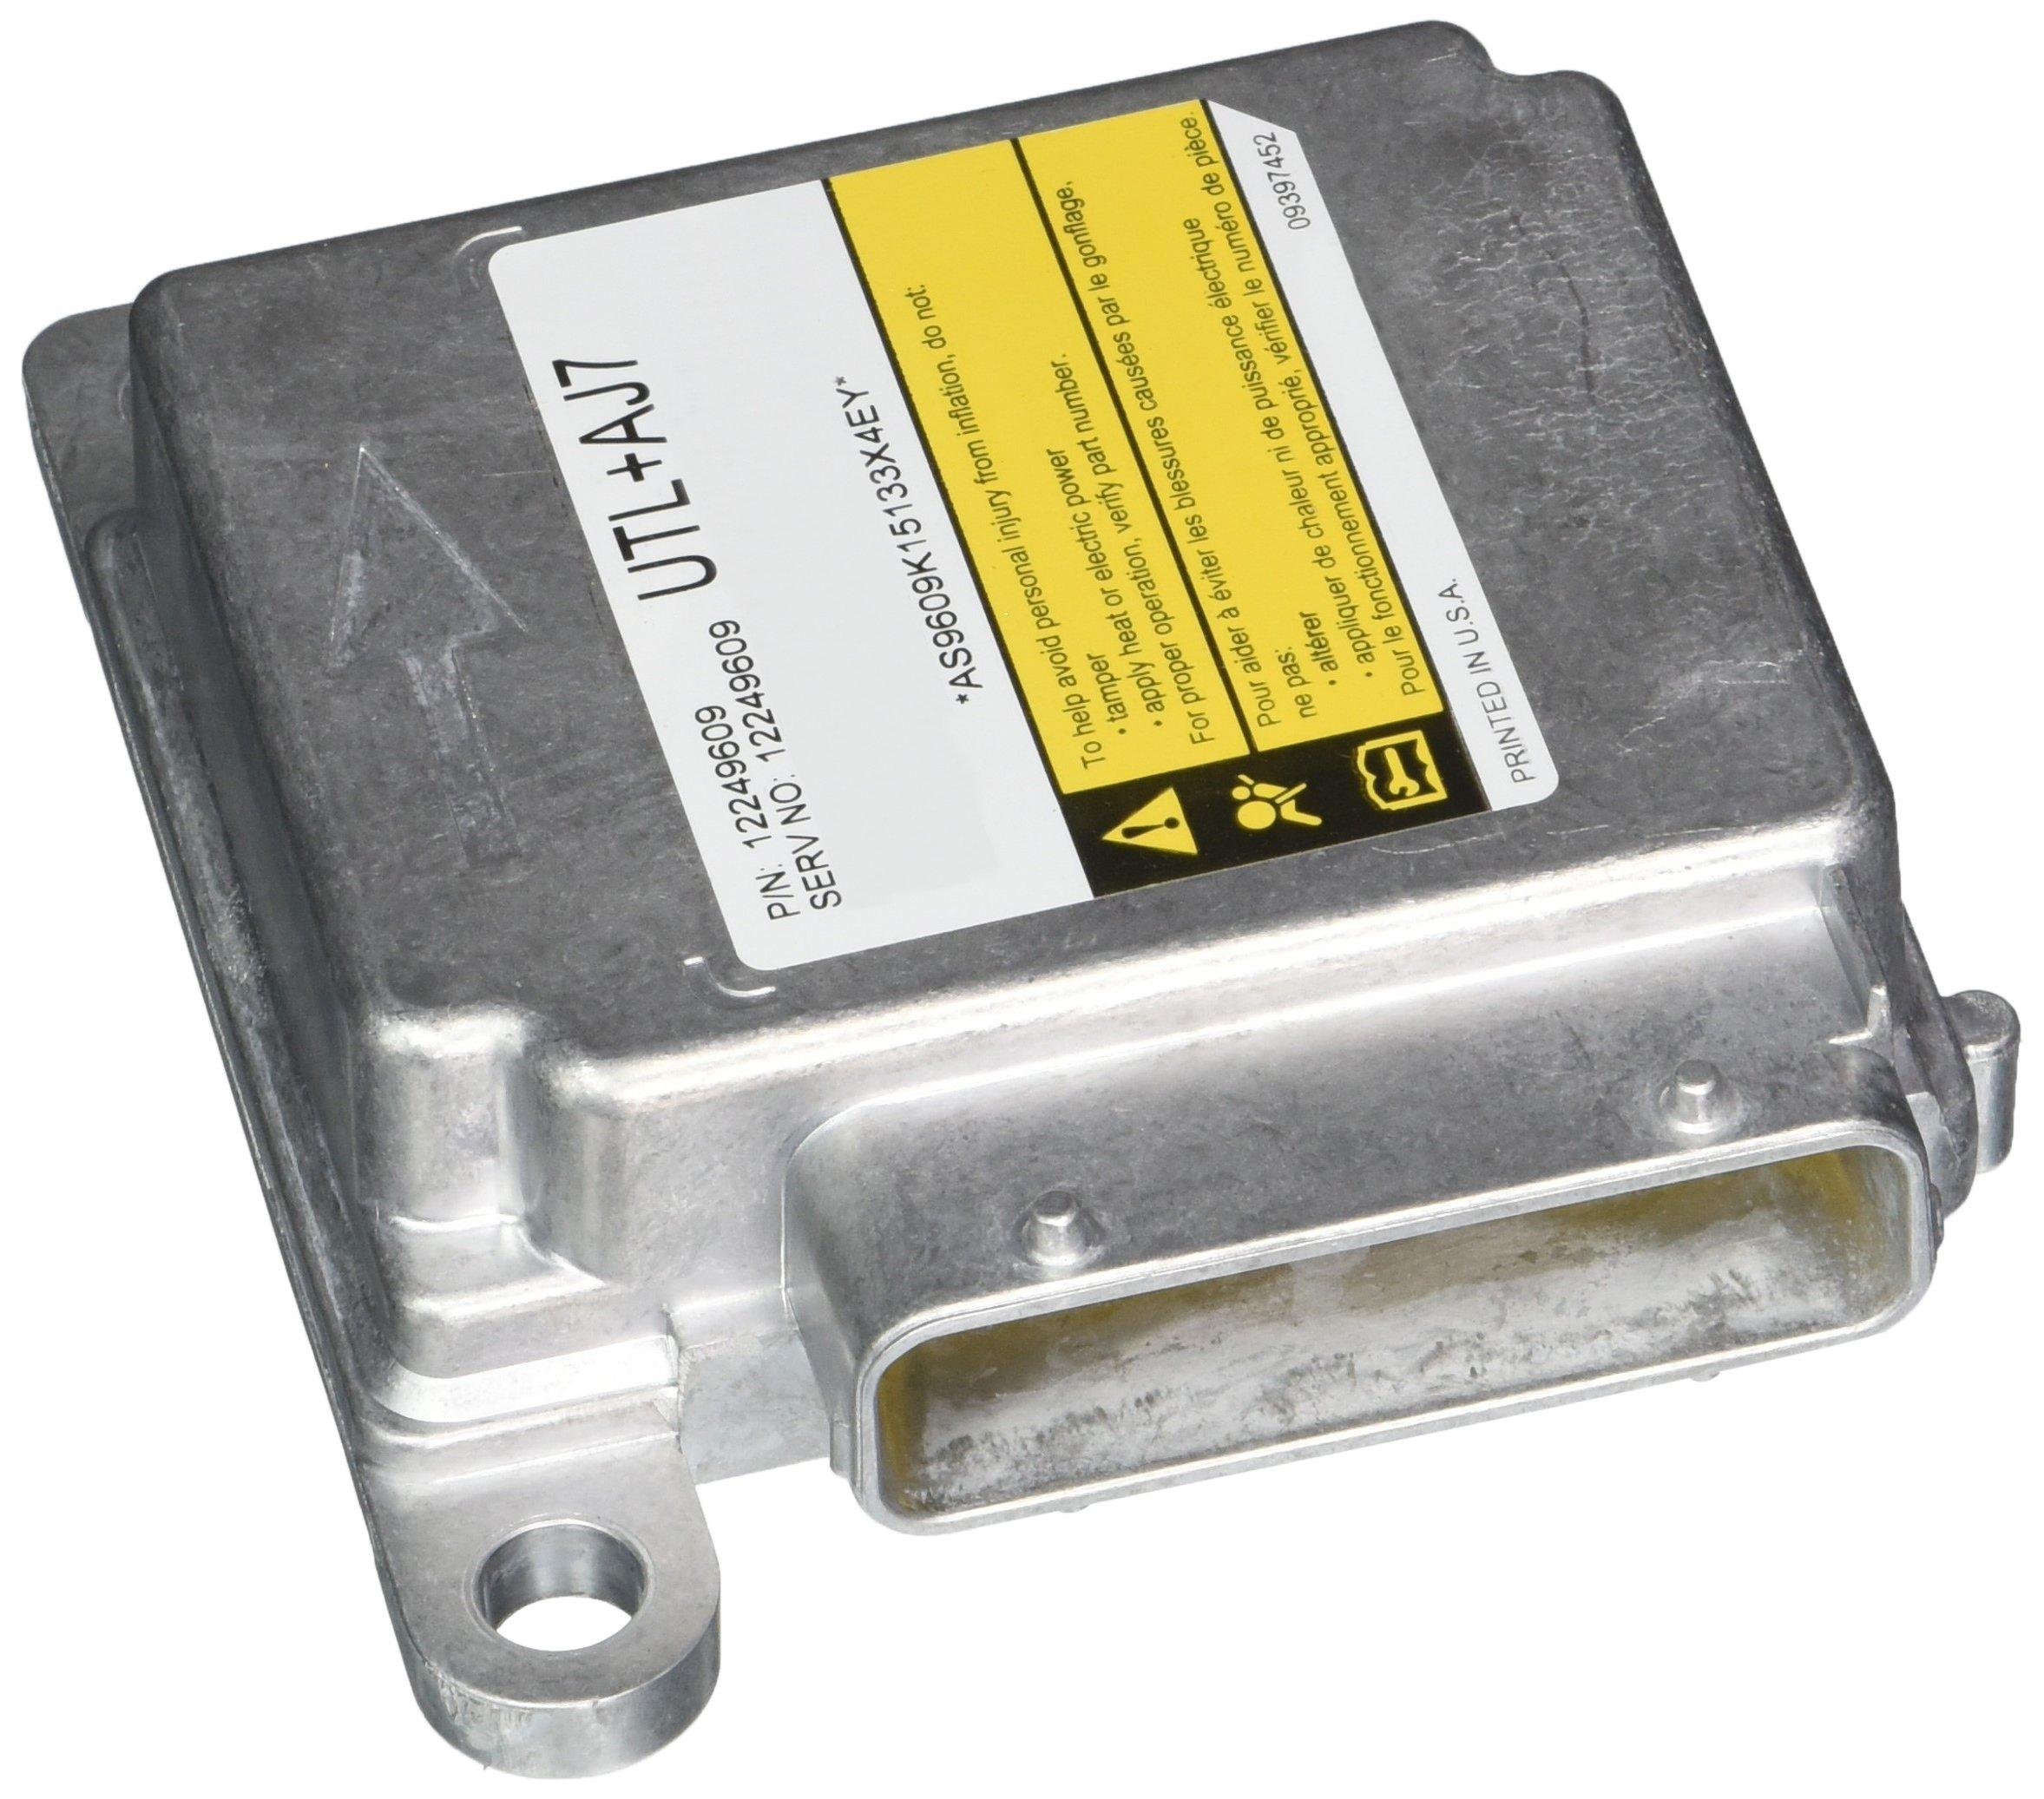 Genuine GM 12249609 Airbag Sensor and Diagnostic Module